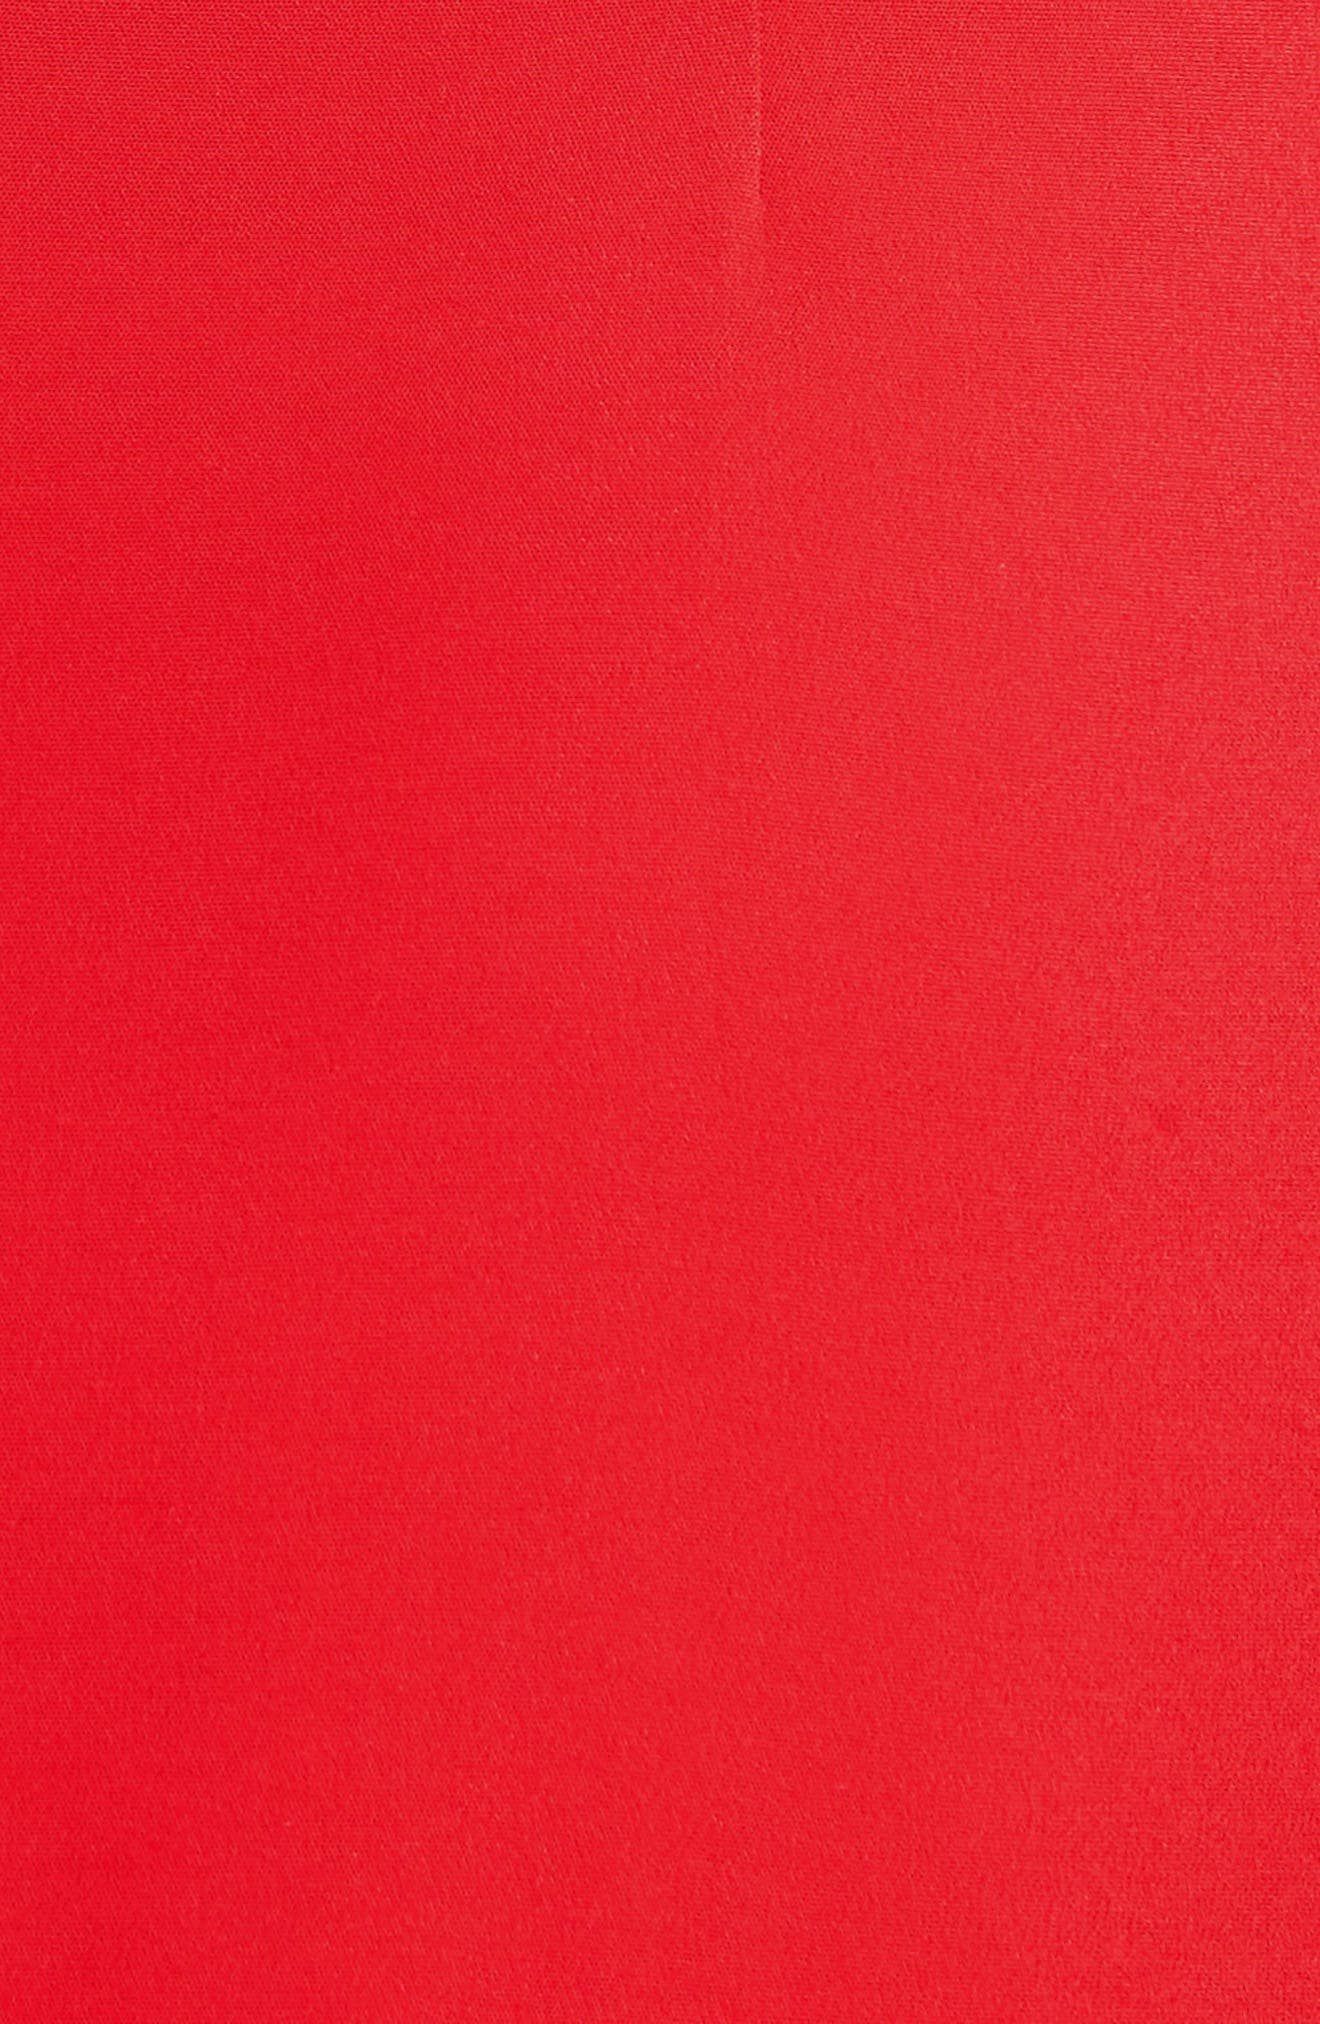 Cowl Neck Pencil Dress,                             Alternate thumbnail 3, color,                             Poppy